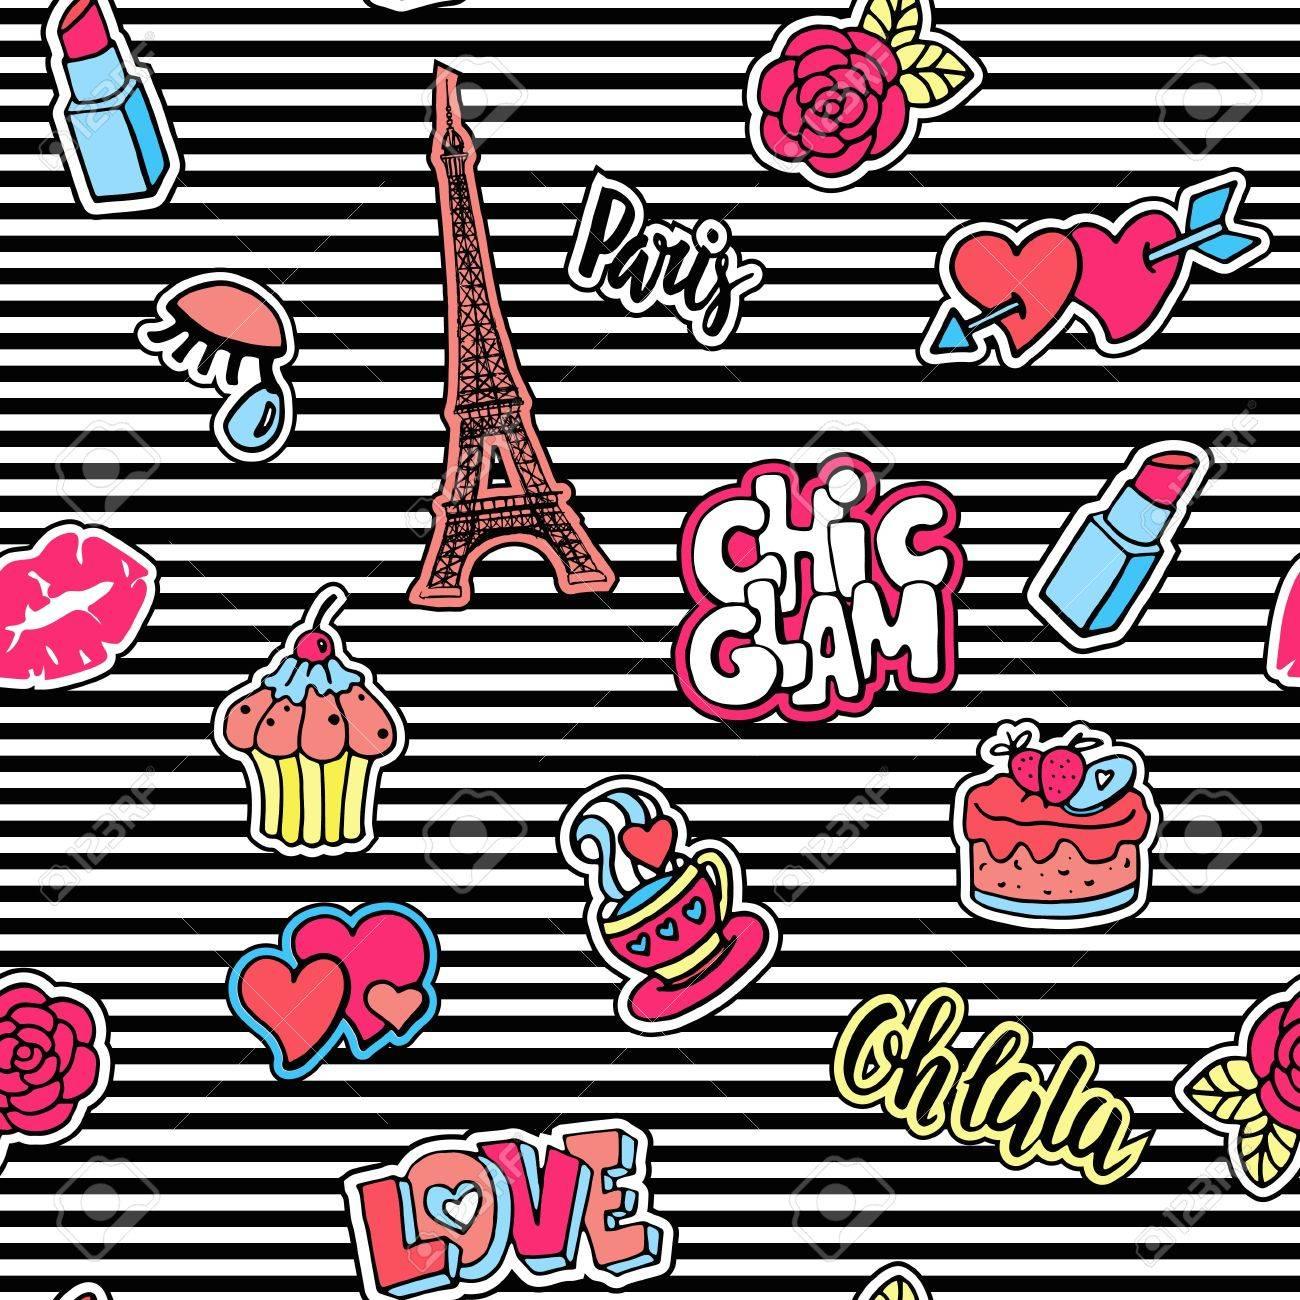 Cute fashion seamless pattern with patch badges.Lips, hearts, Eiffel tower, flower, cake, eye, lipstick. Paris romantic design. - 66091198